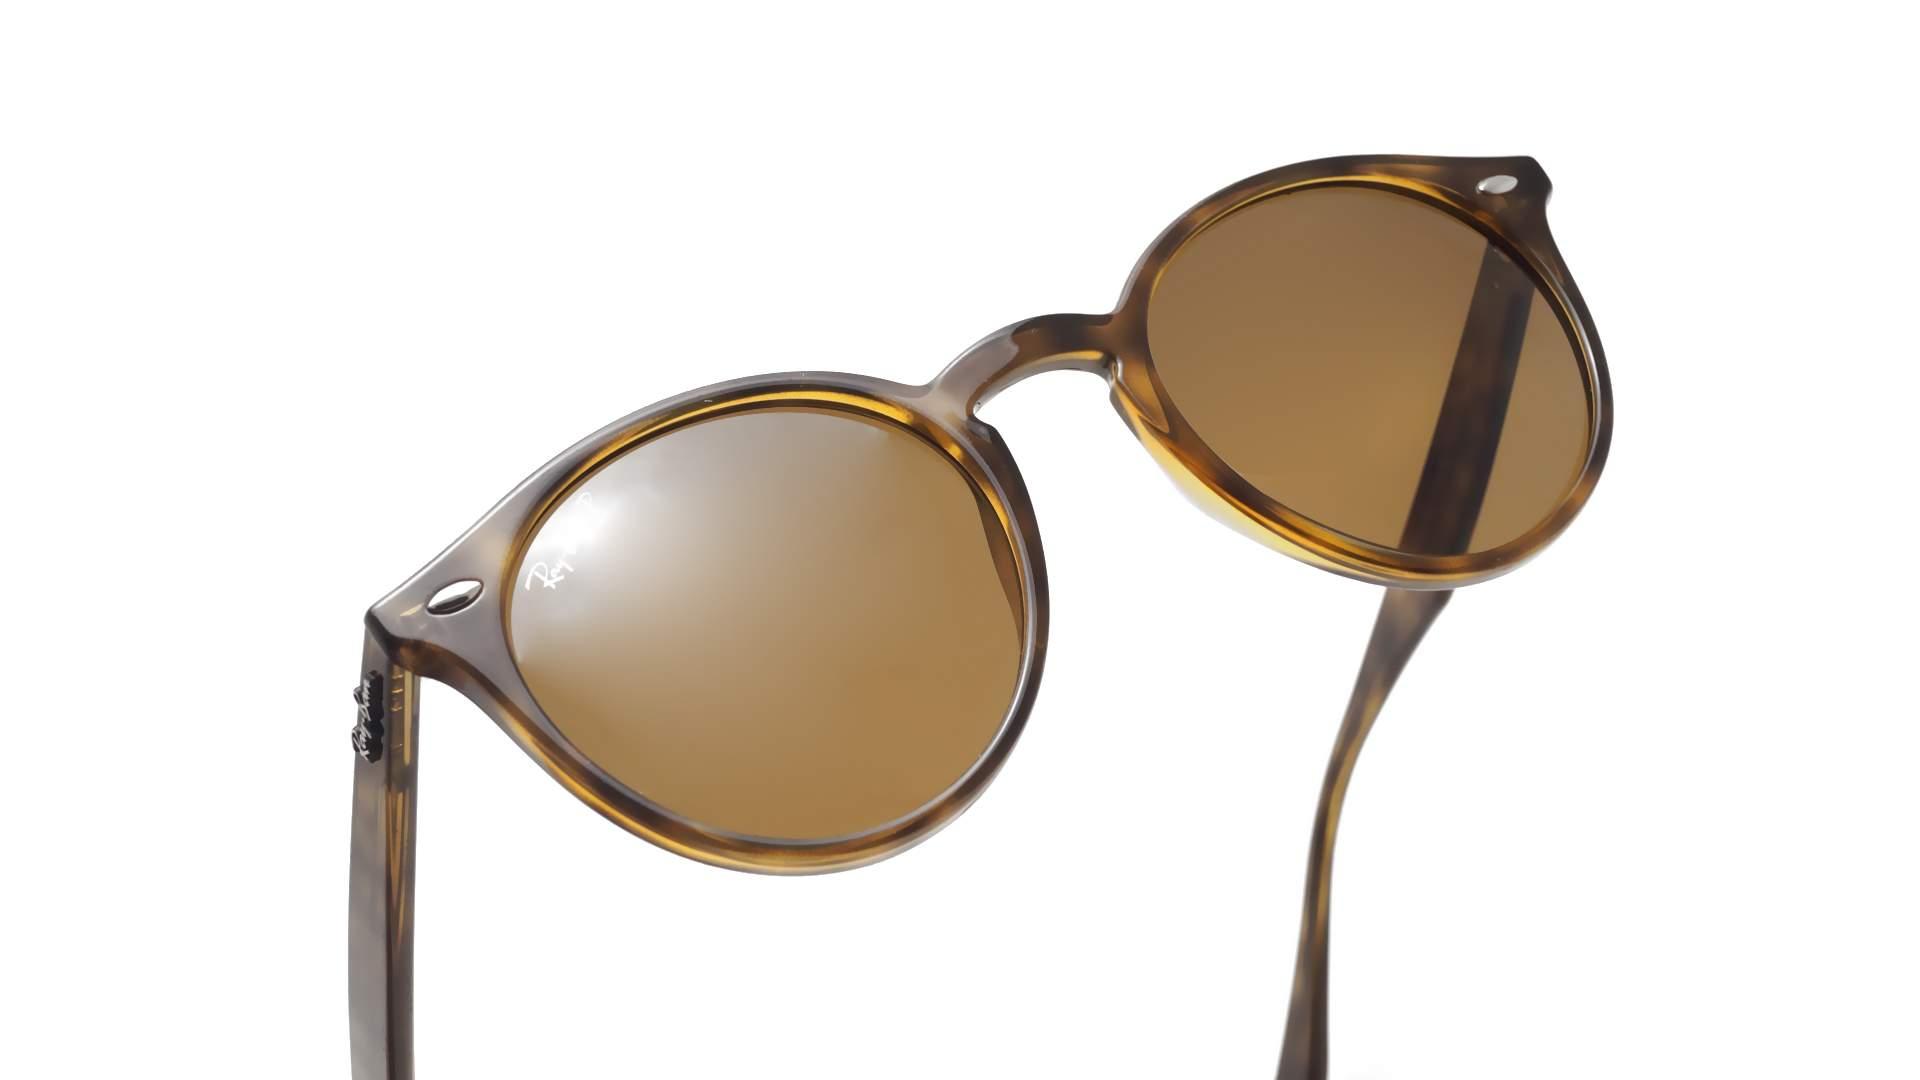 f327559d3d15b ... switzerland sunglasses ray ban rb2180 710 83 49 21 tortoise medium  polarized cd832 6a6e9